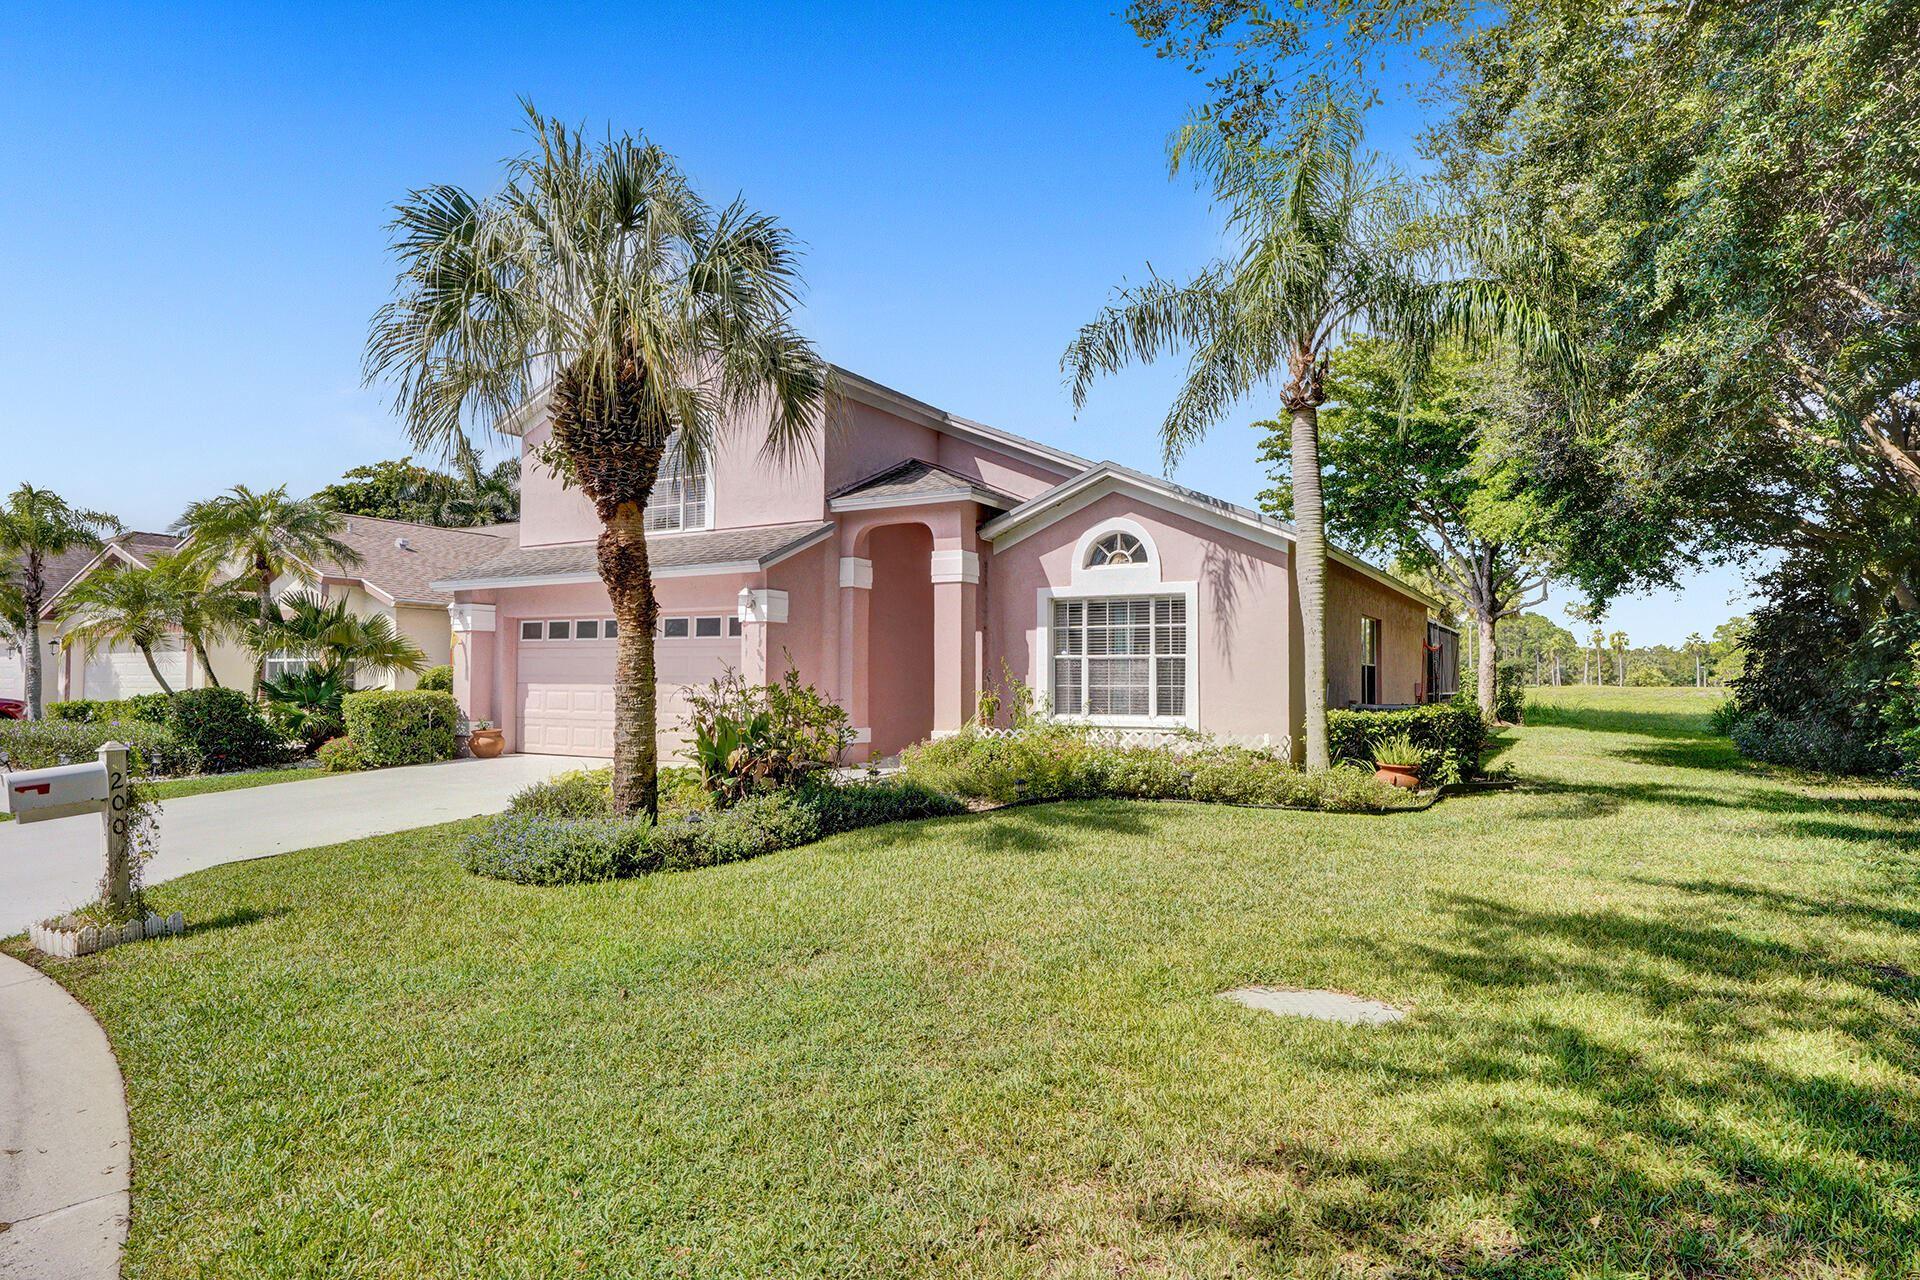 200 Trails End, Greenacres, FL 33413 - #: RX-10747843